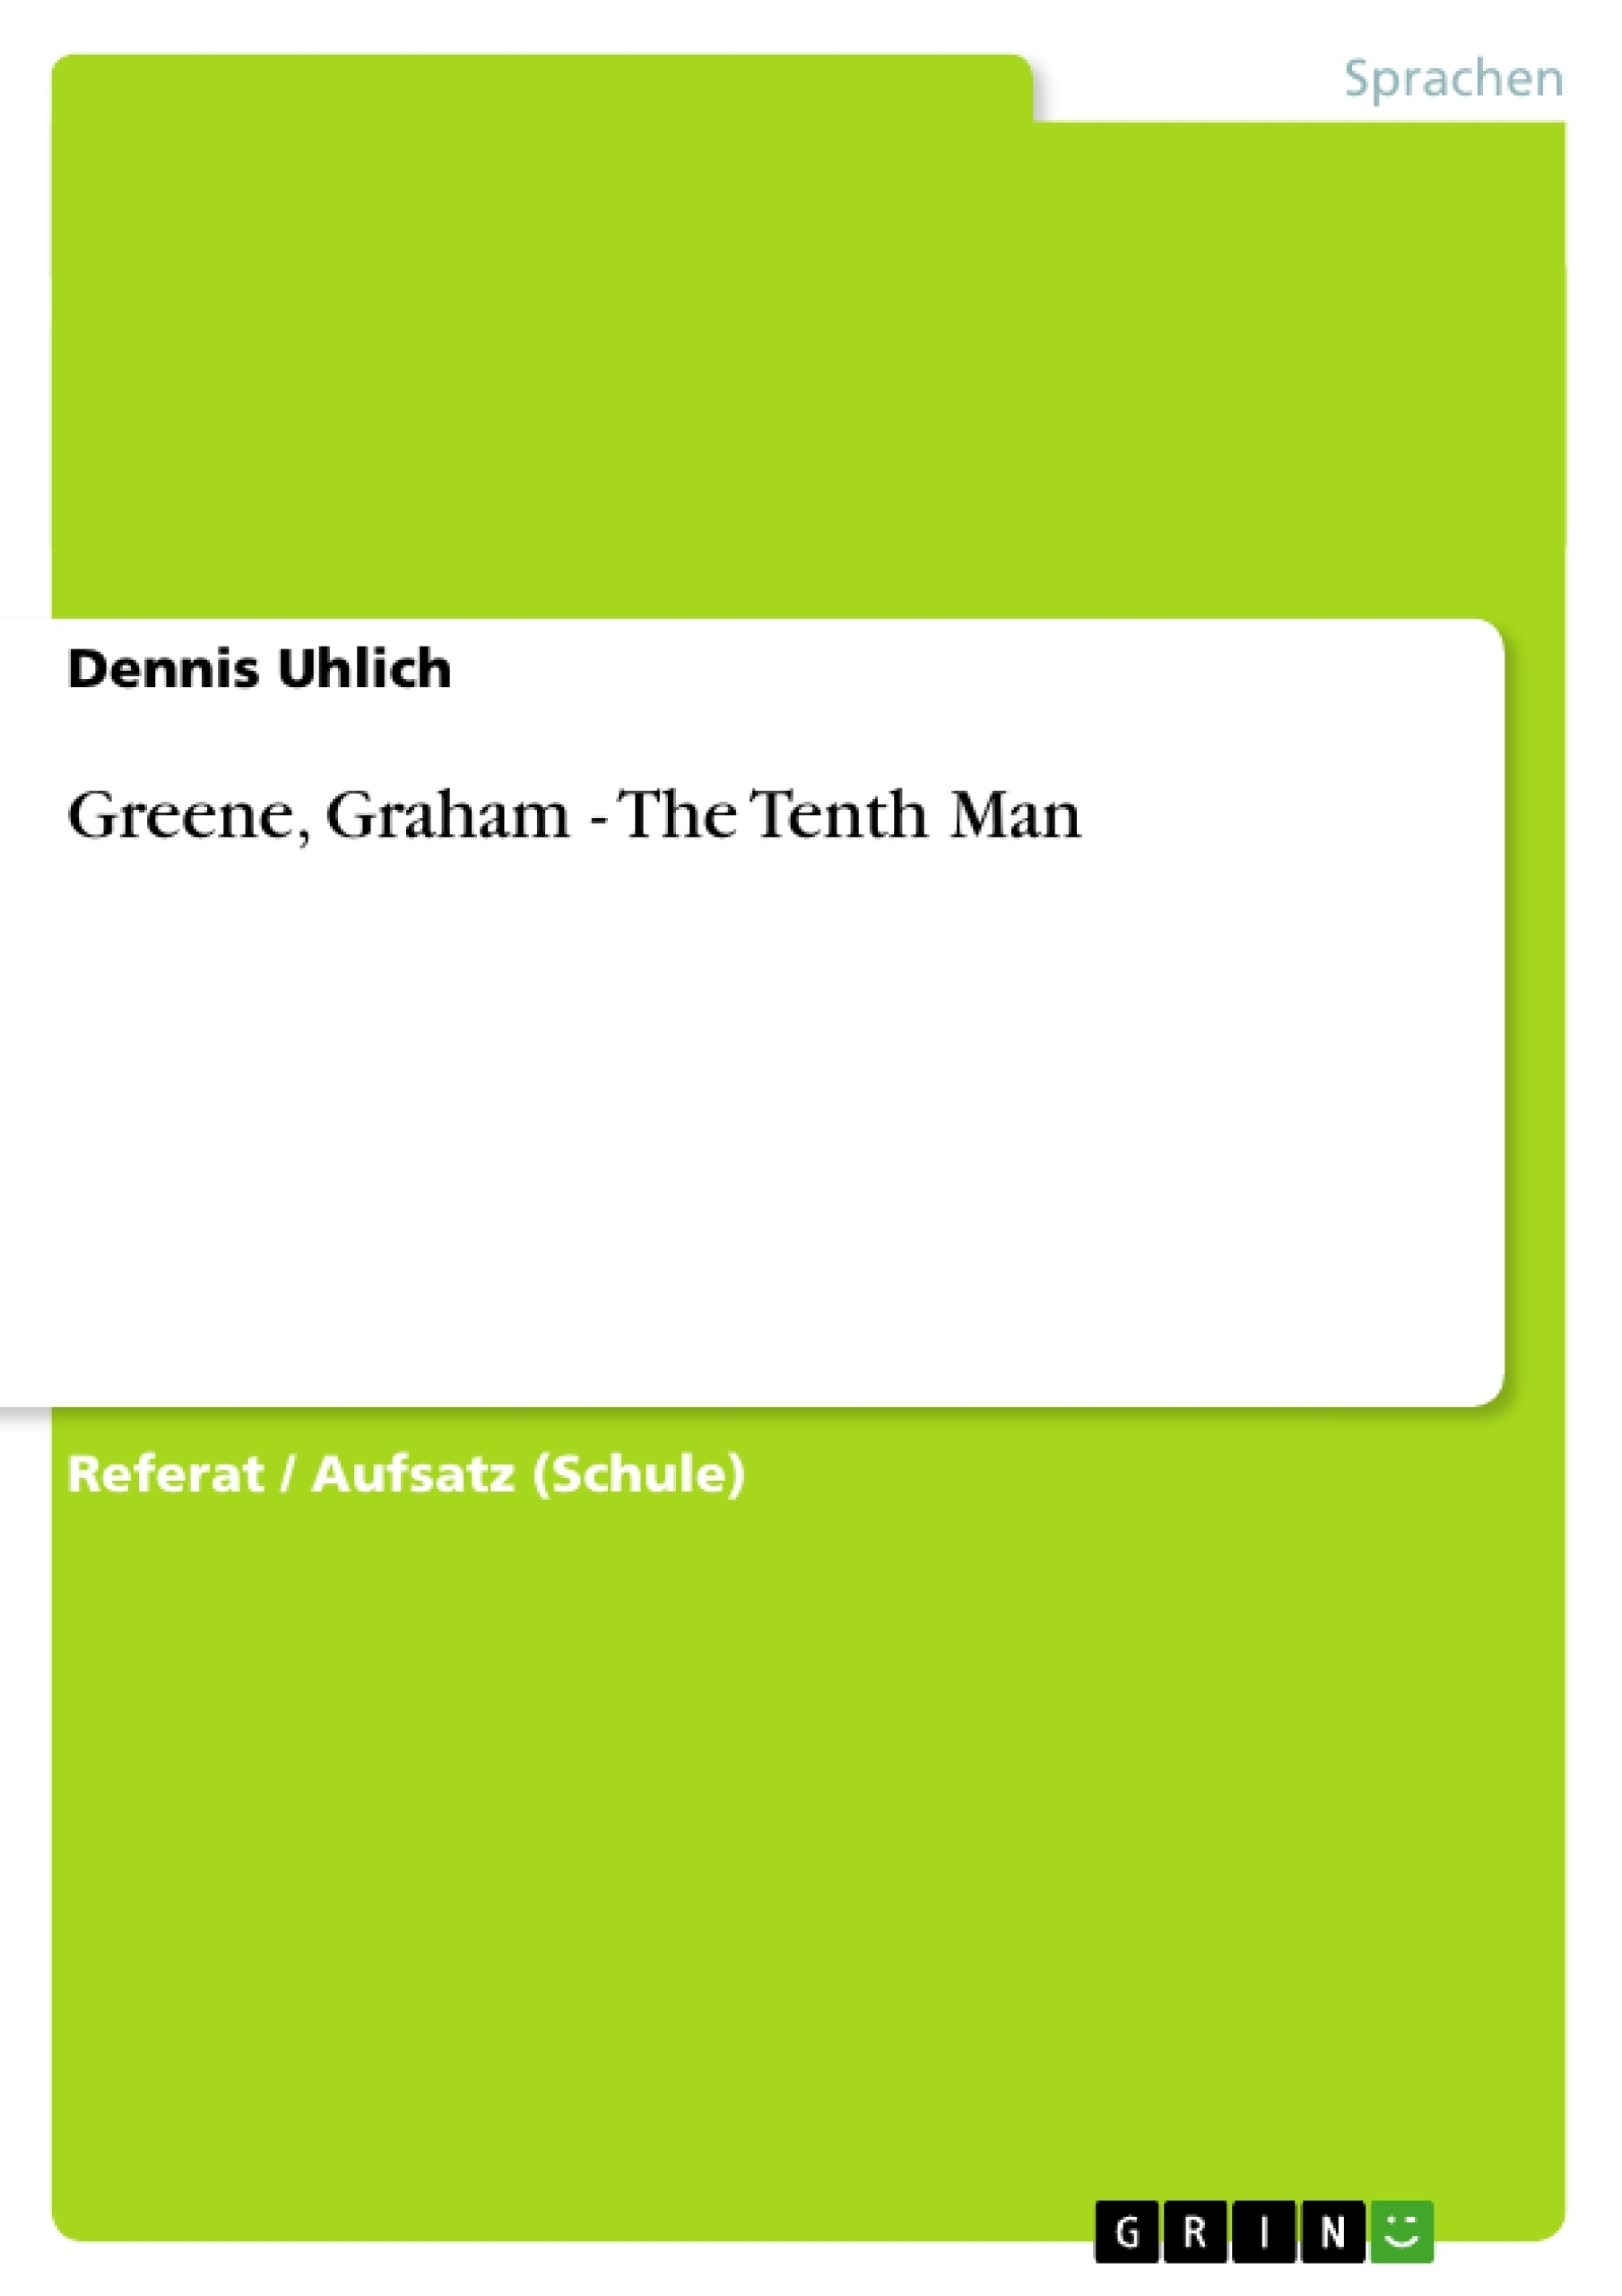 Titel: Greene, Graham - The Tenth Man